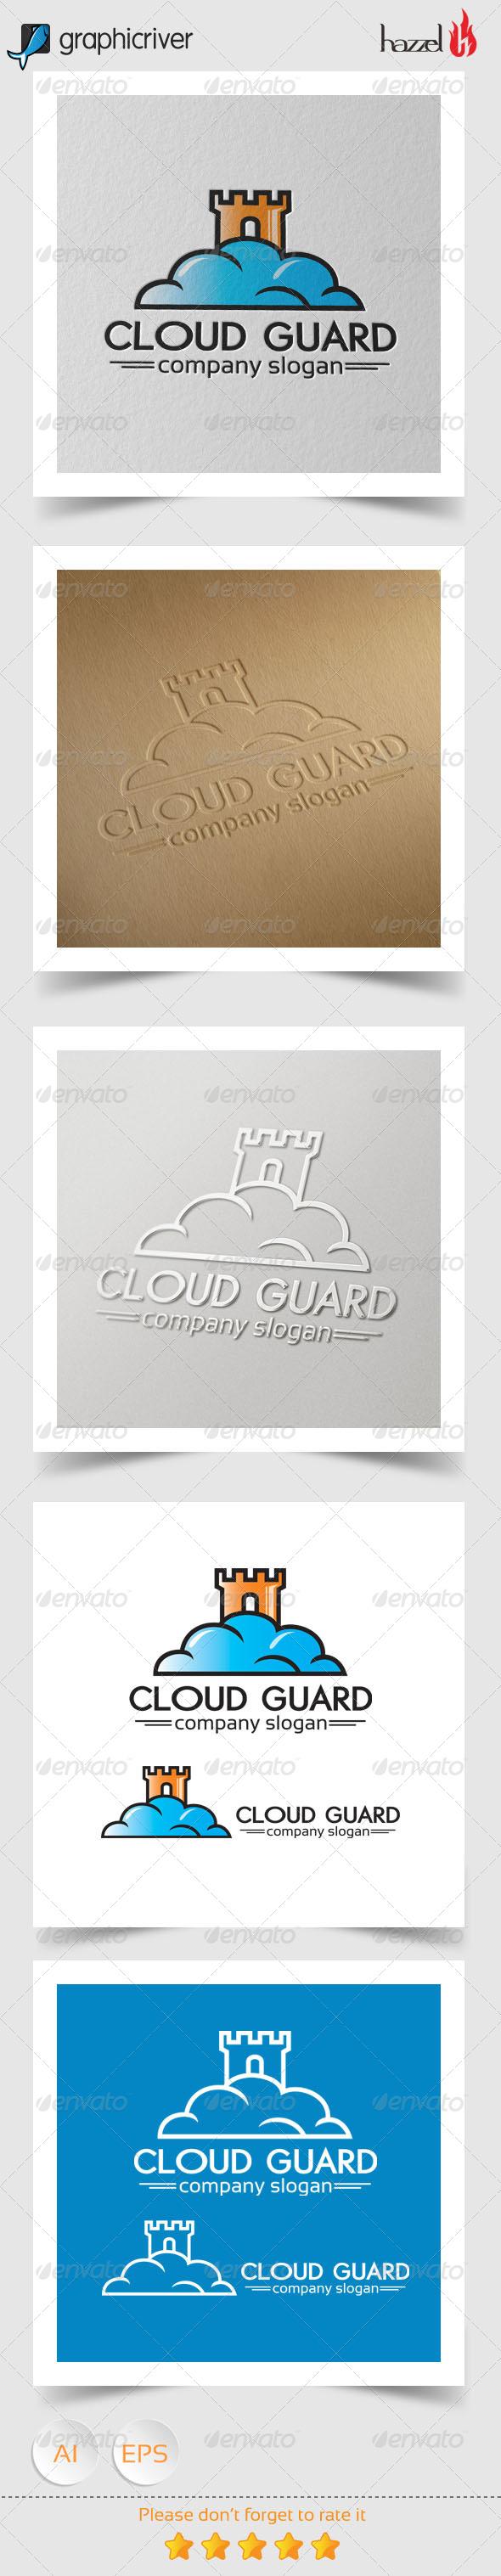 GraphicRiver Cloud Guard Logo 8237698